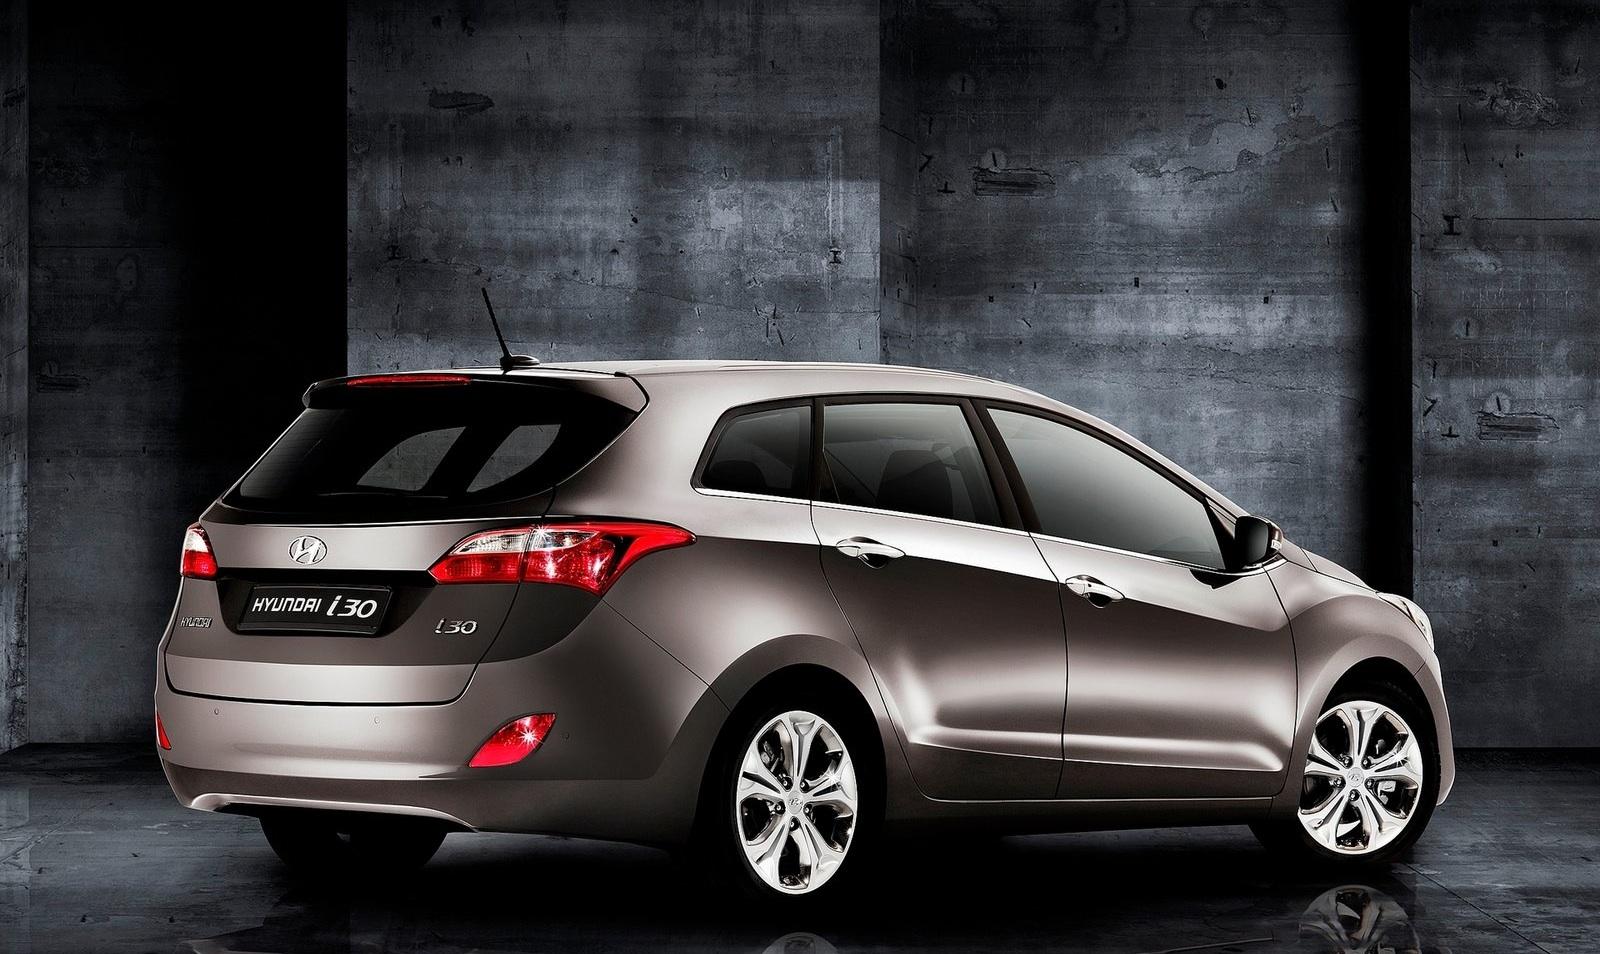 2013 Hyundai i30 Wagon (i30cw) Revealed Ahead Of Australian Debut